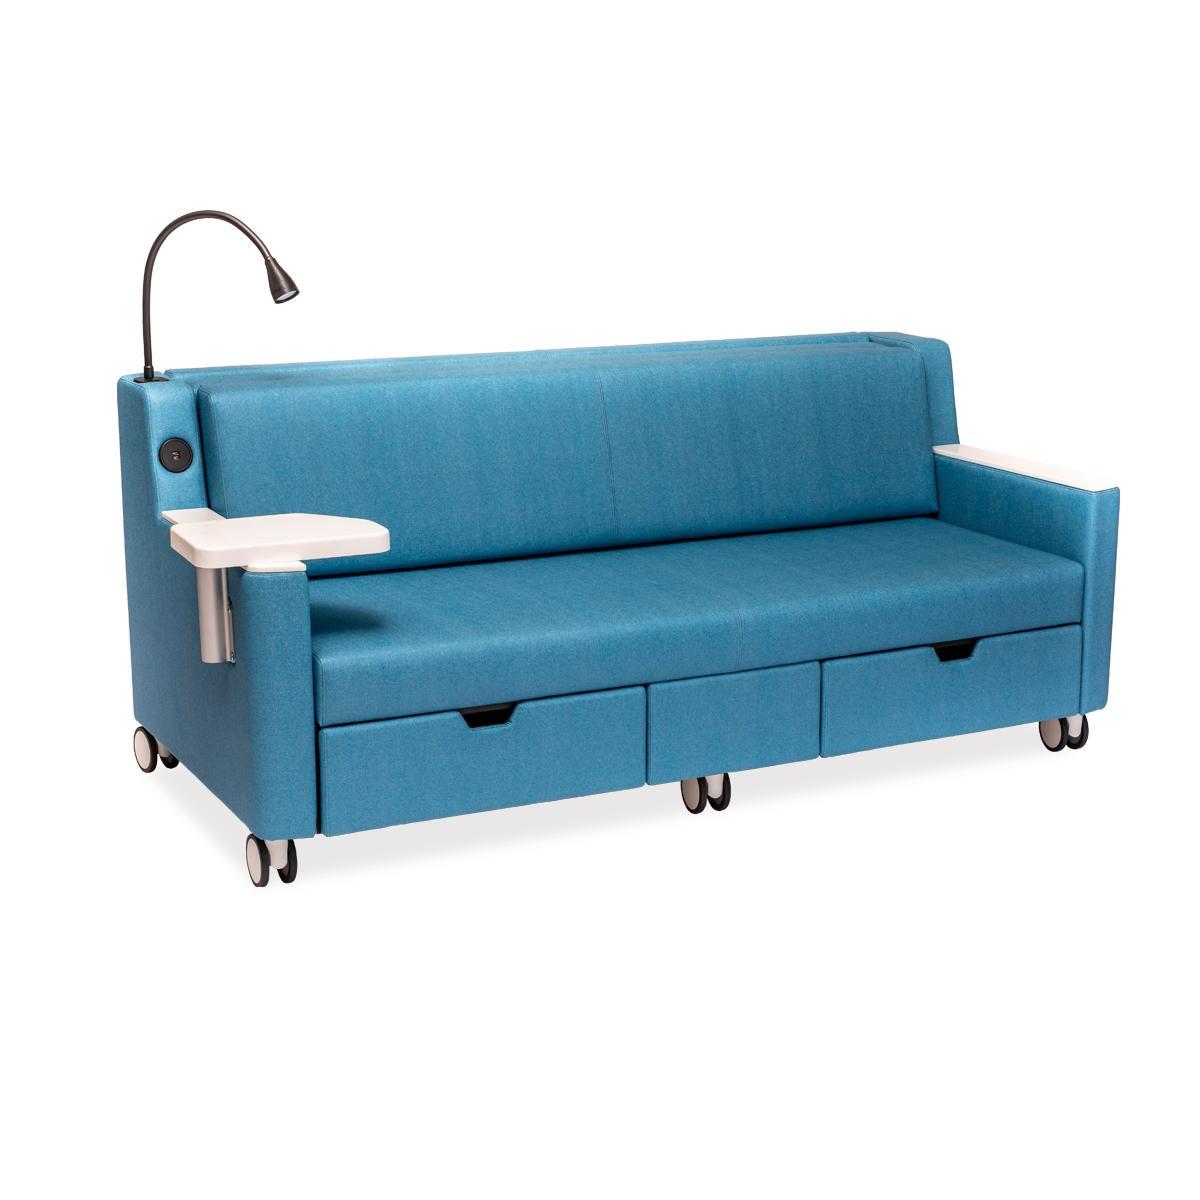 Sofá cama Sleeper: mesa giratoria